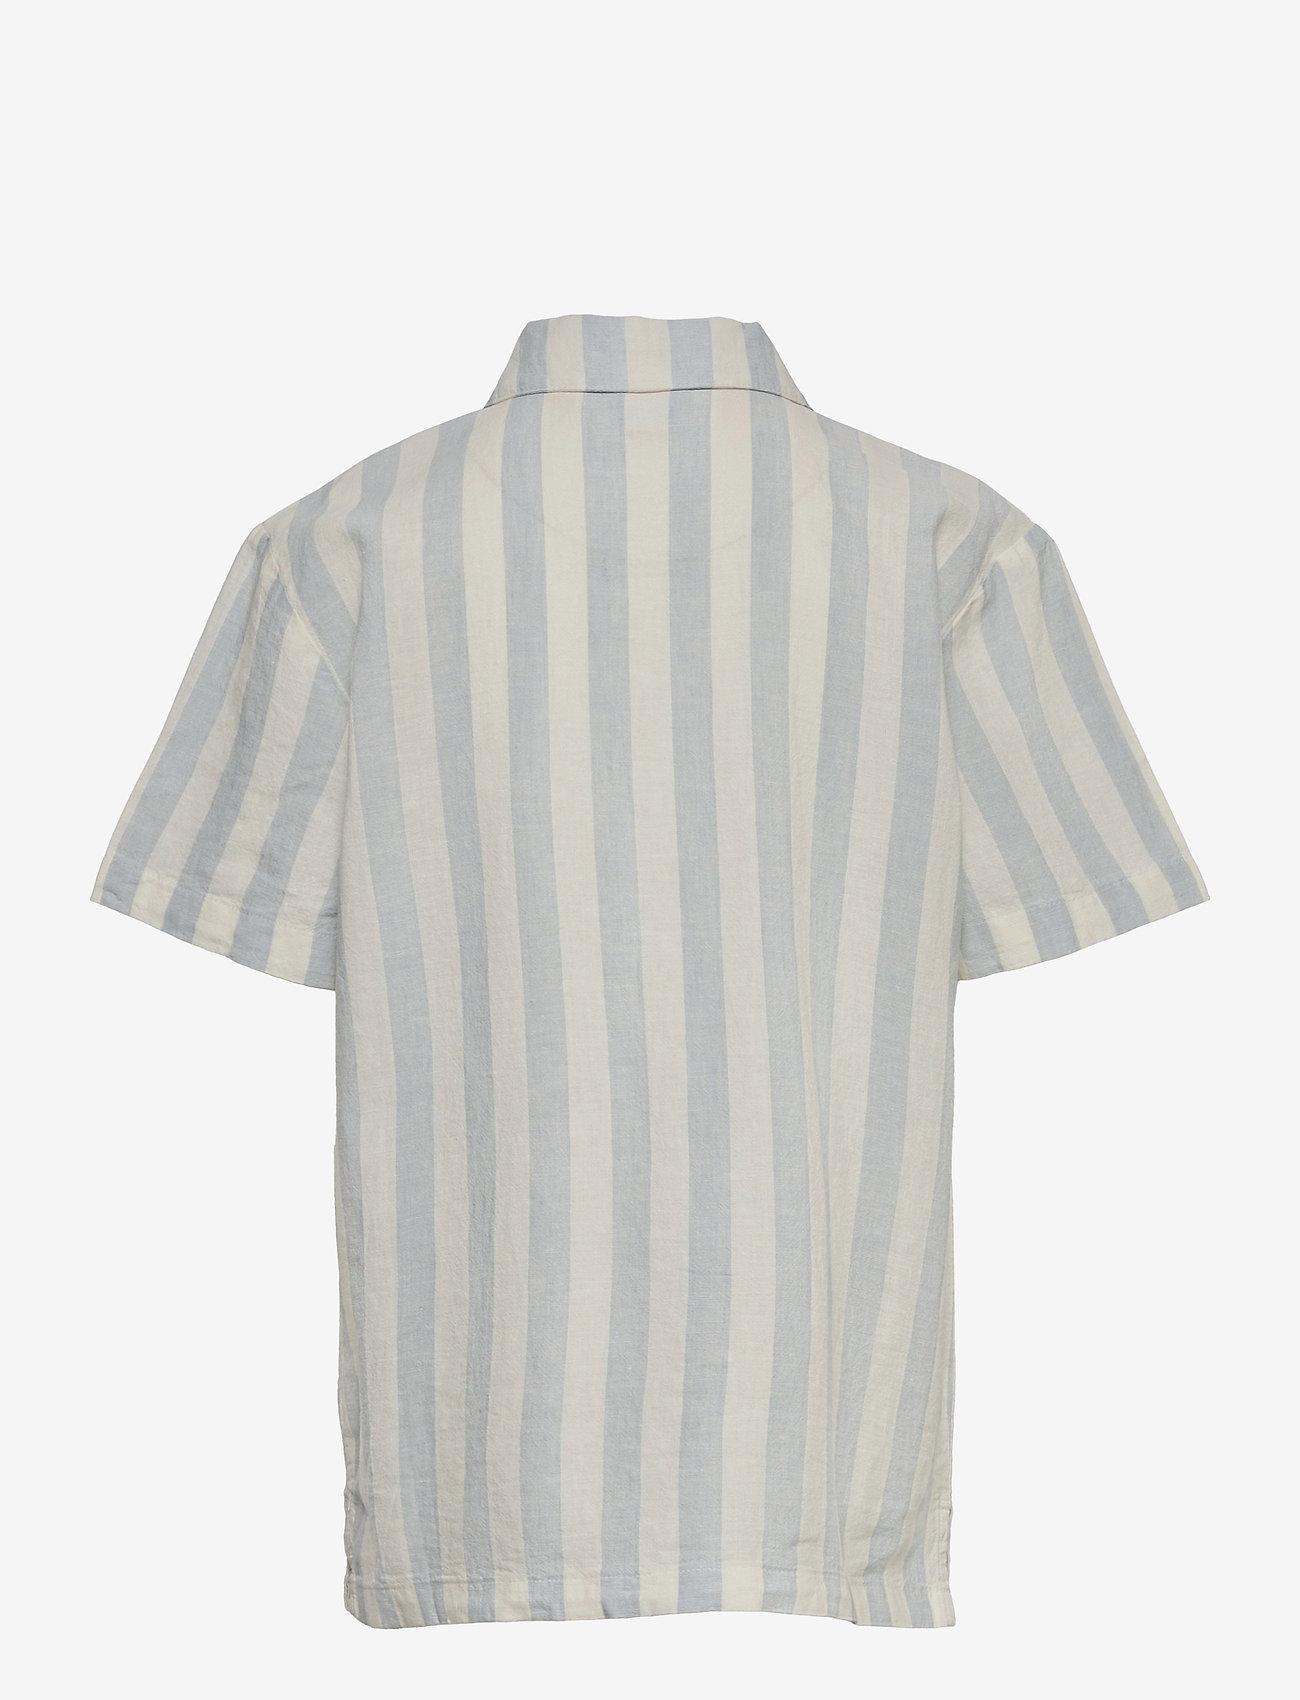 Lindex - Shirt shortsleeved  linen cott - shirts - white - 1